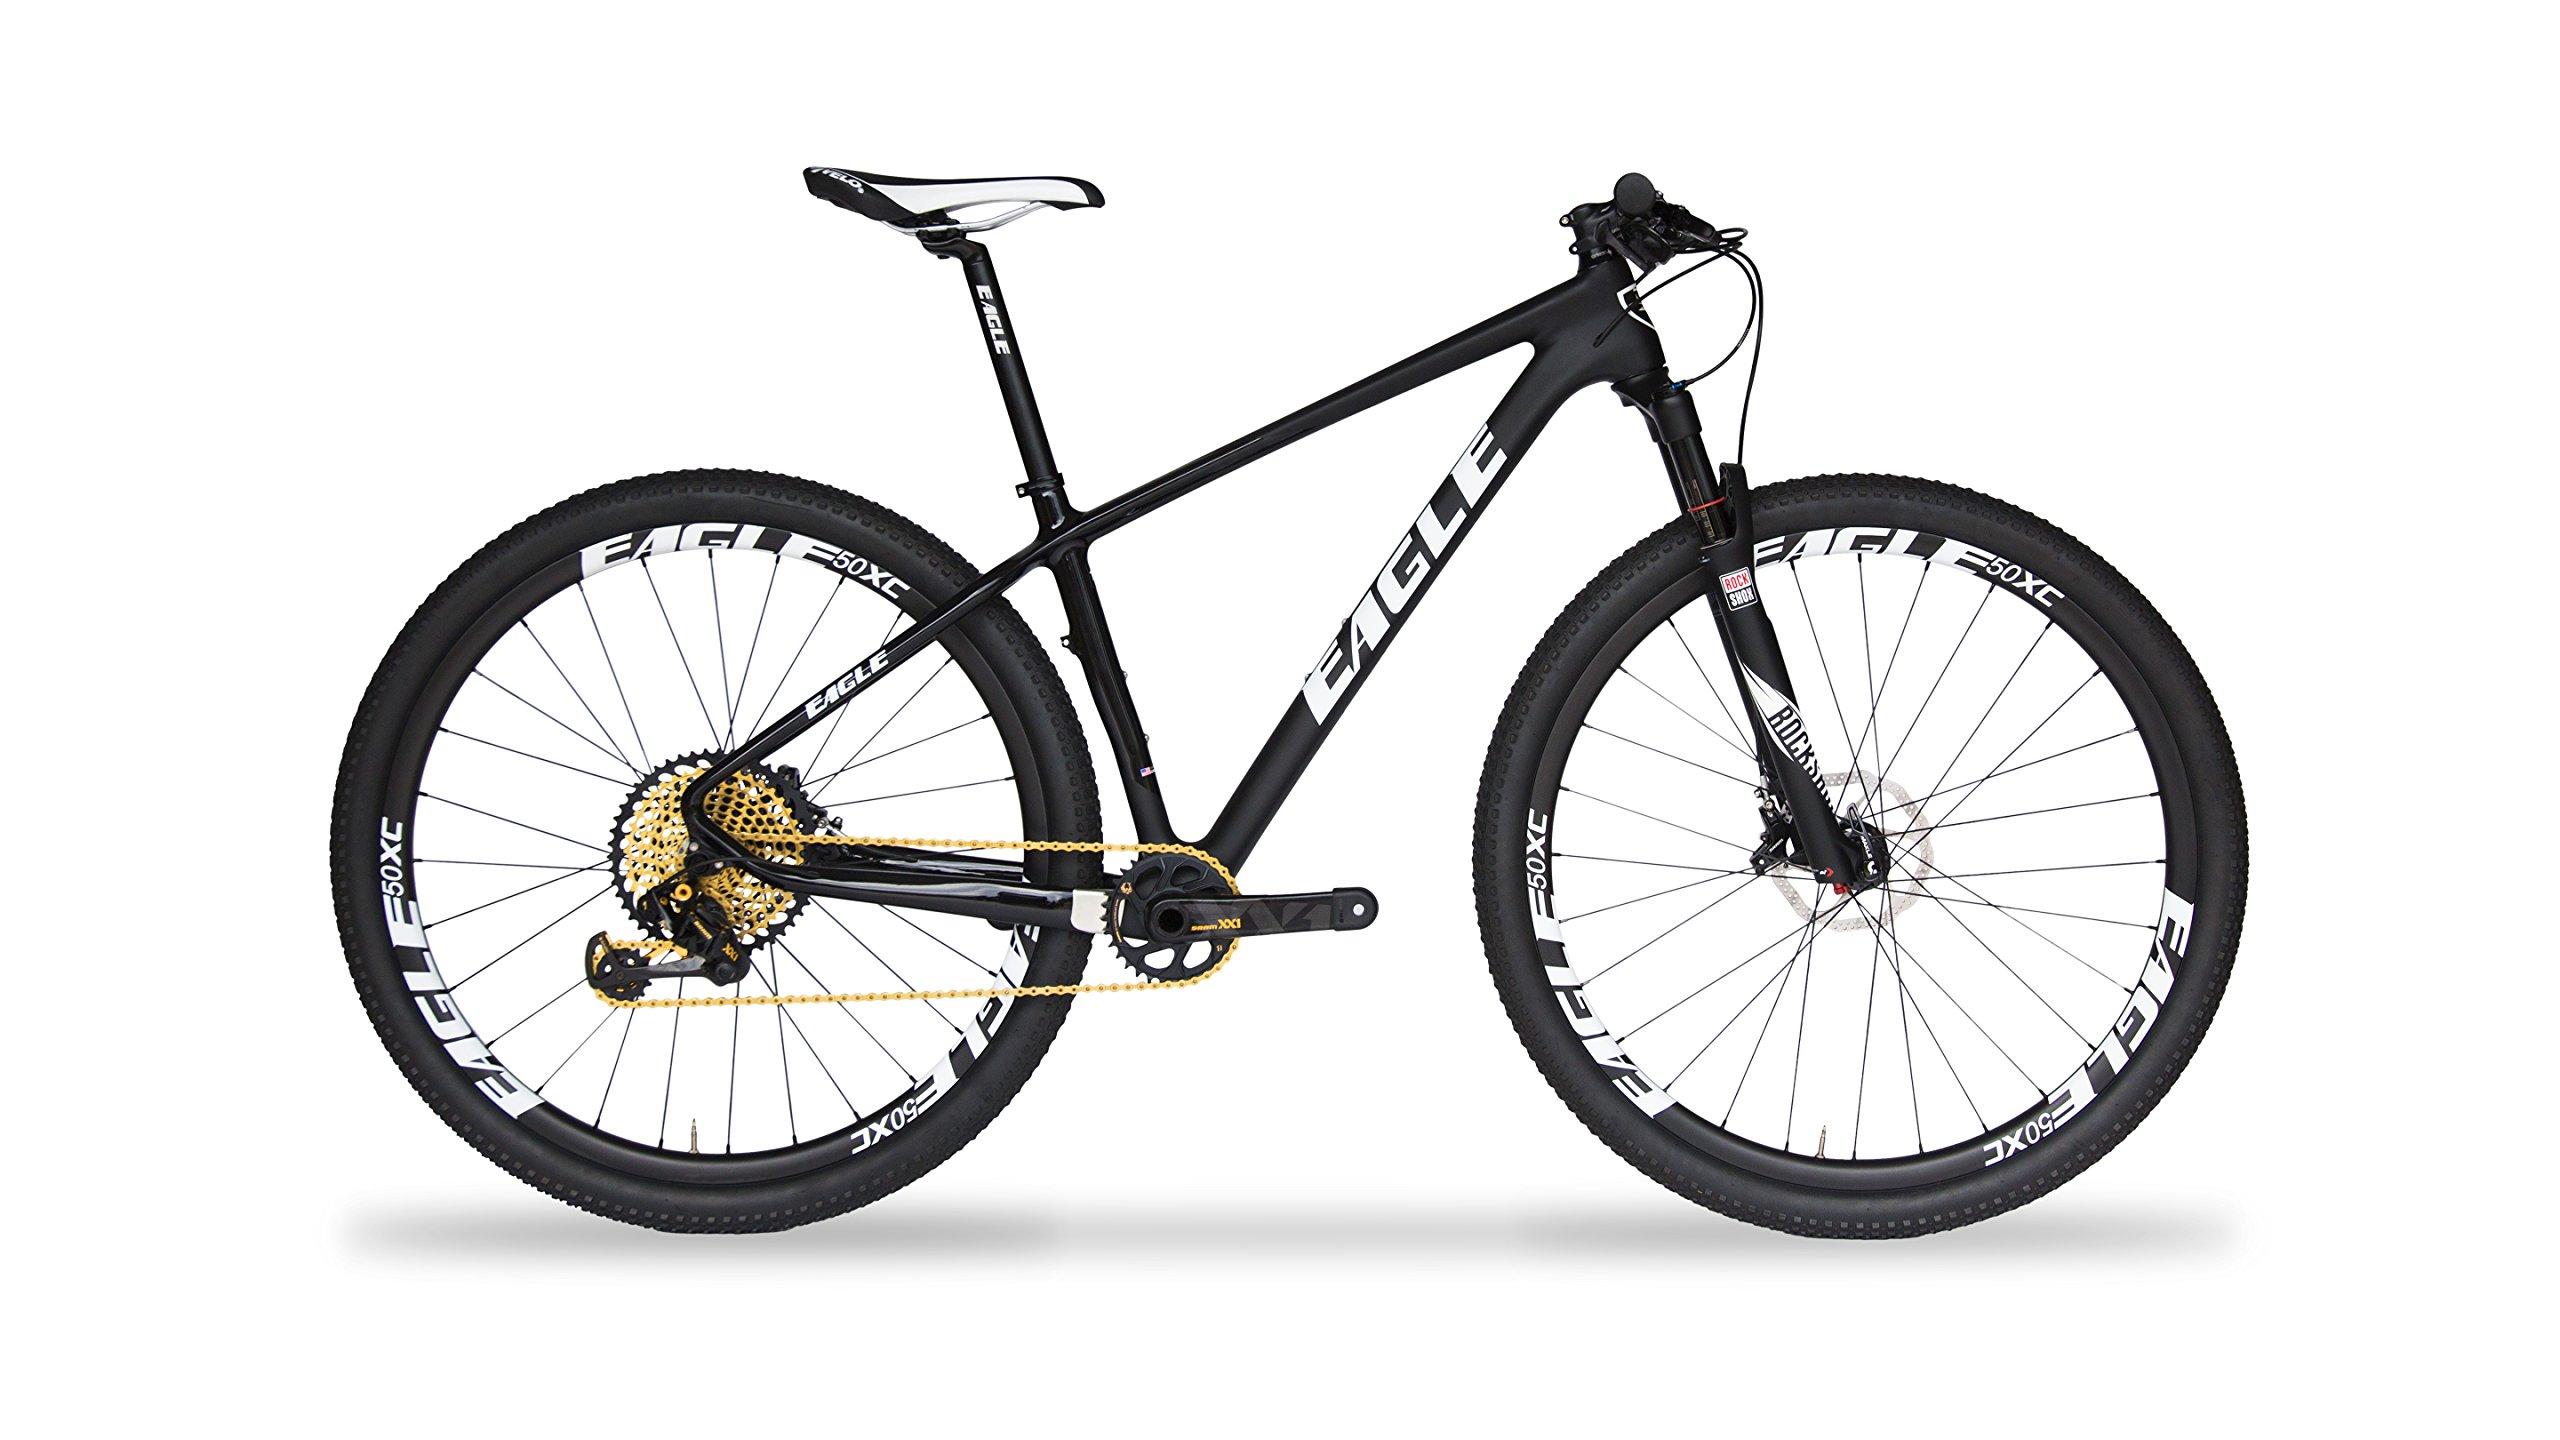 Eagle Patriot Carbon Fiber Mountain Bike